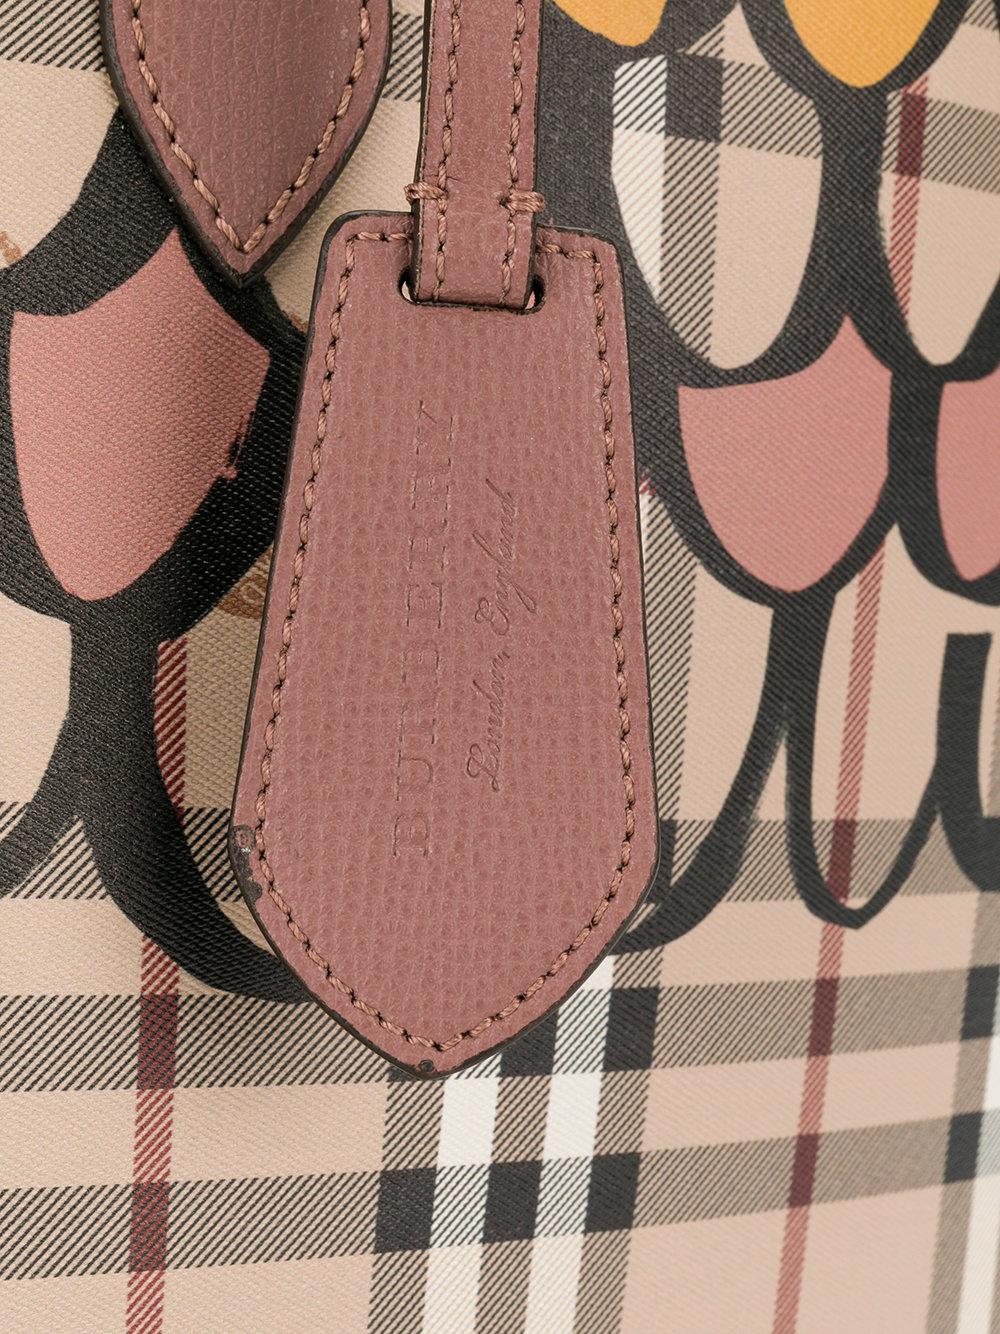 Burberry Leather Medium Reversible Tote Bag in Brown